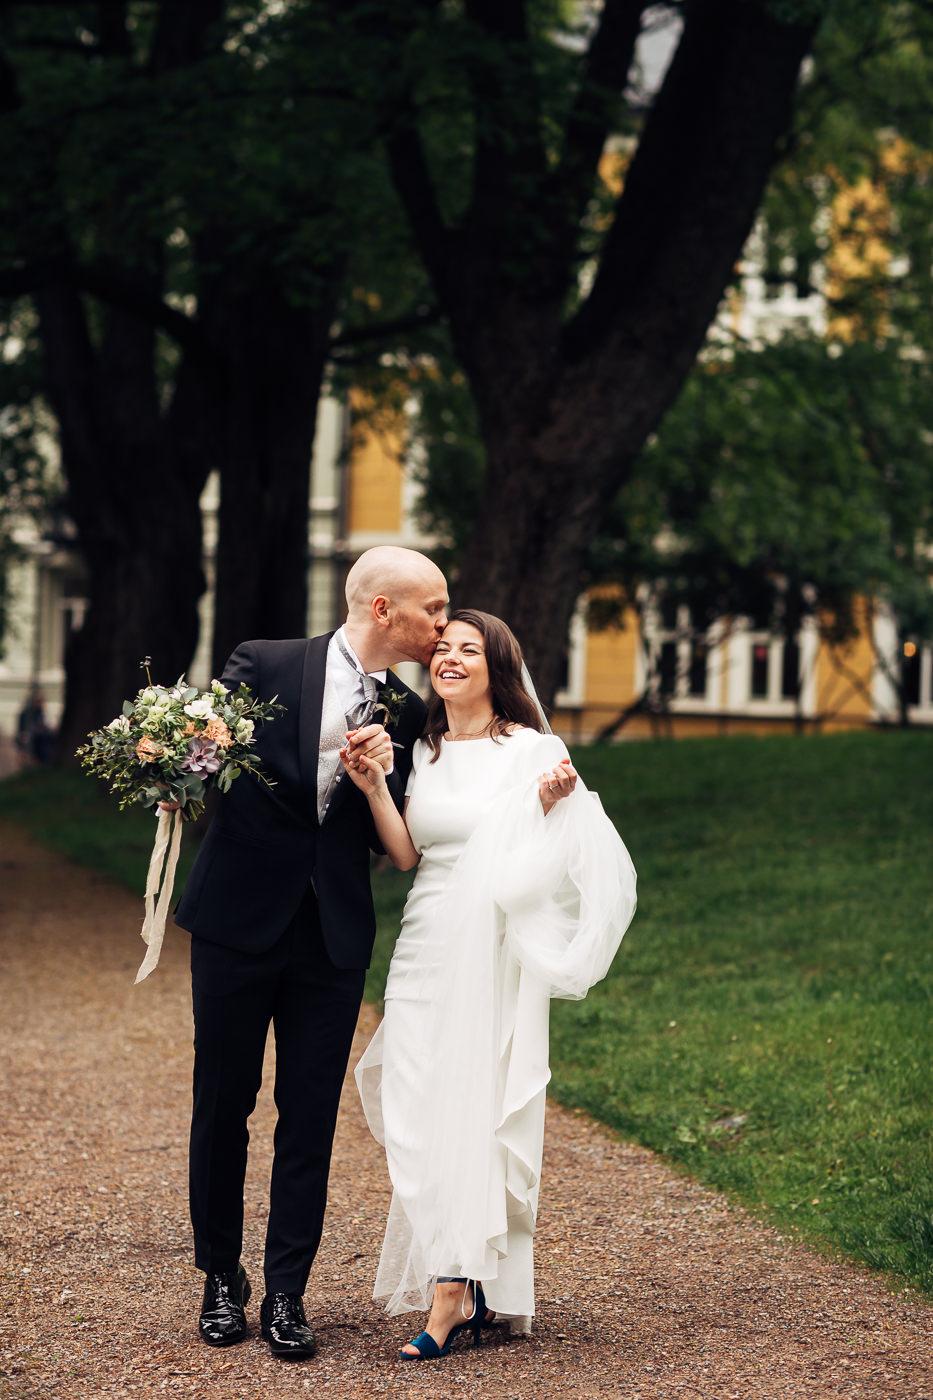 Malene & Ole Martin - elegant dansk- norskt bryllup i Oslo Bryllup Gamle Aker Oslo 43 Akershus